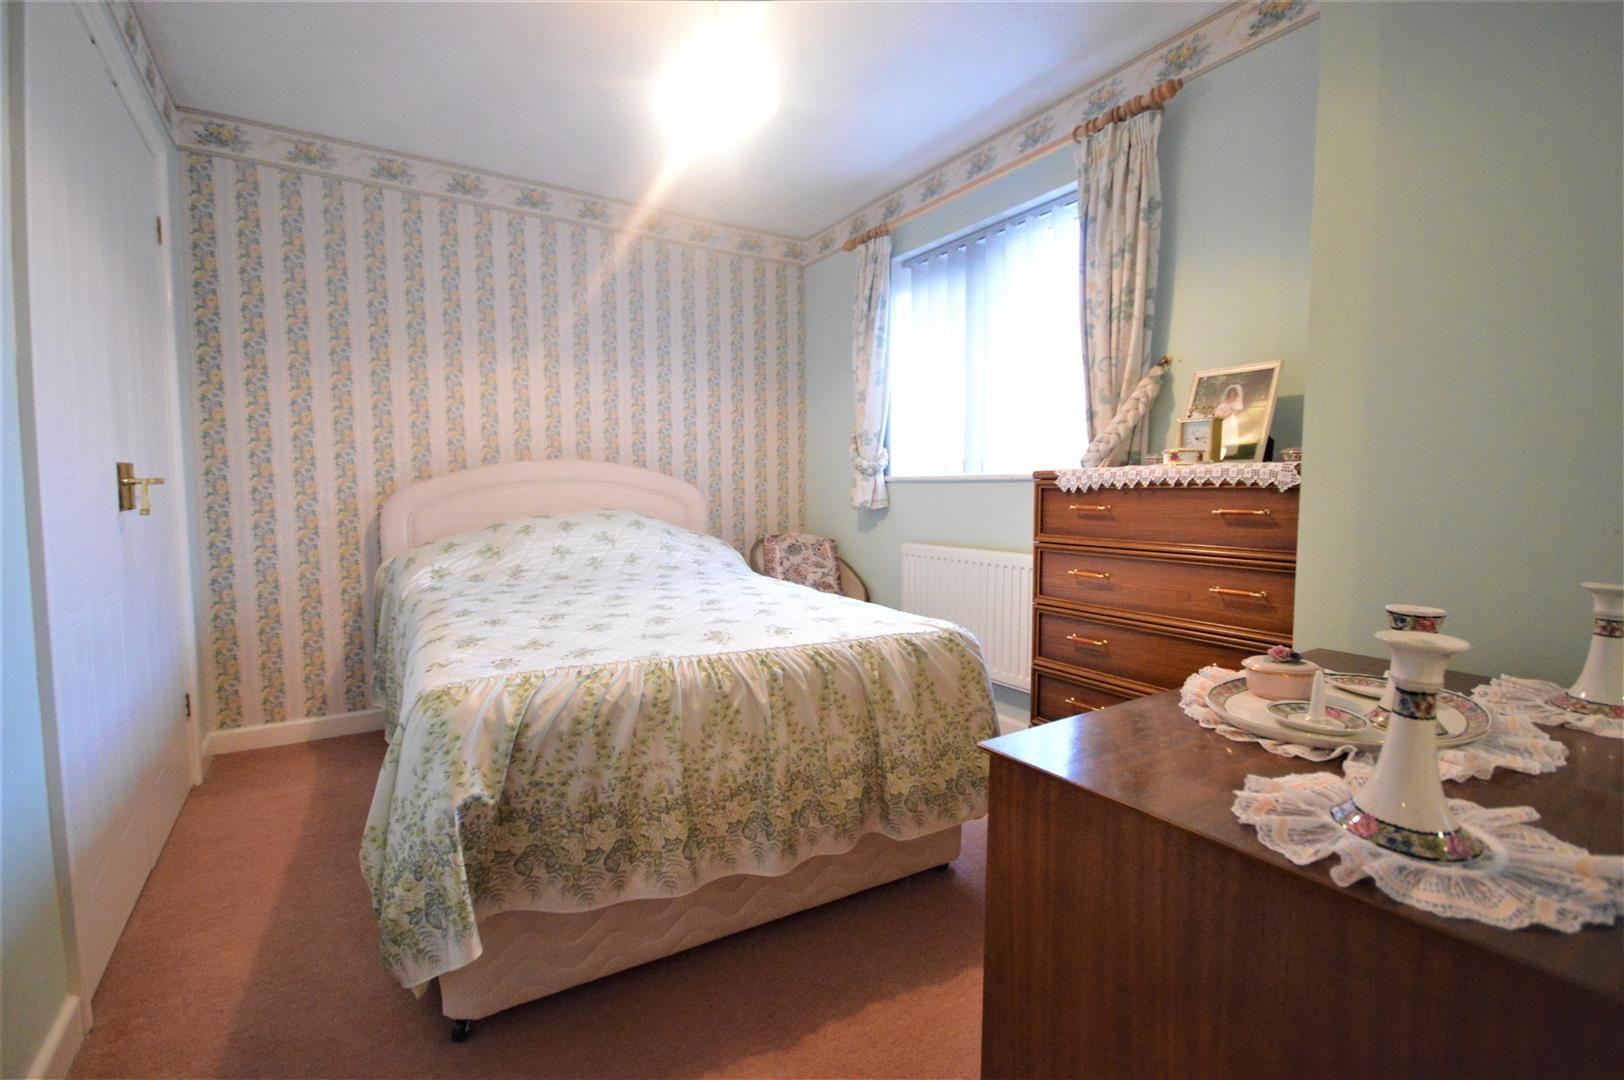 3 bed detached for sale in Leominster 6